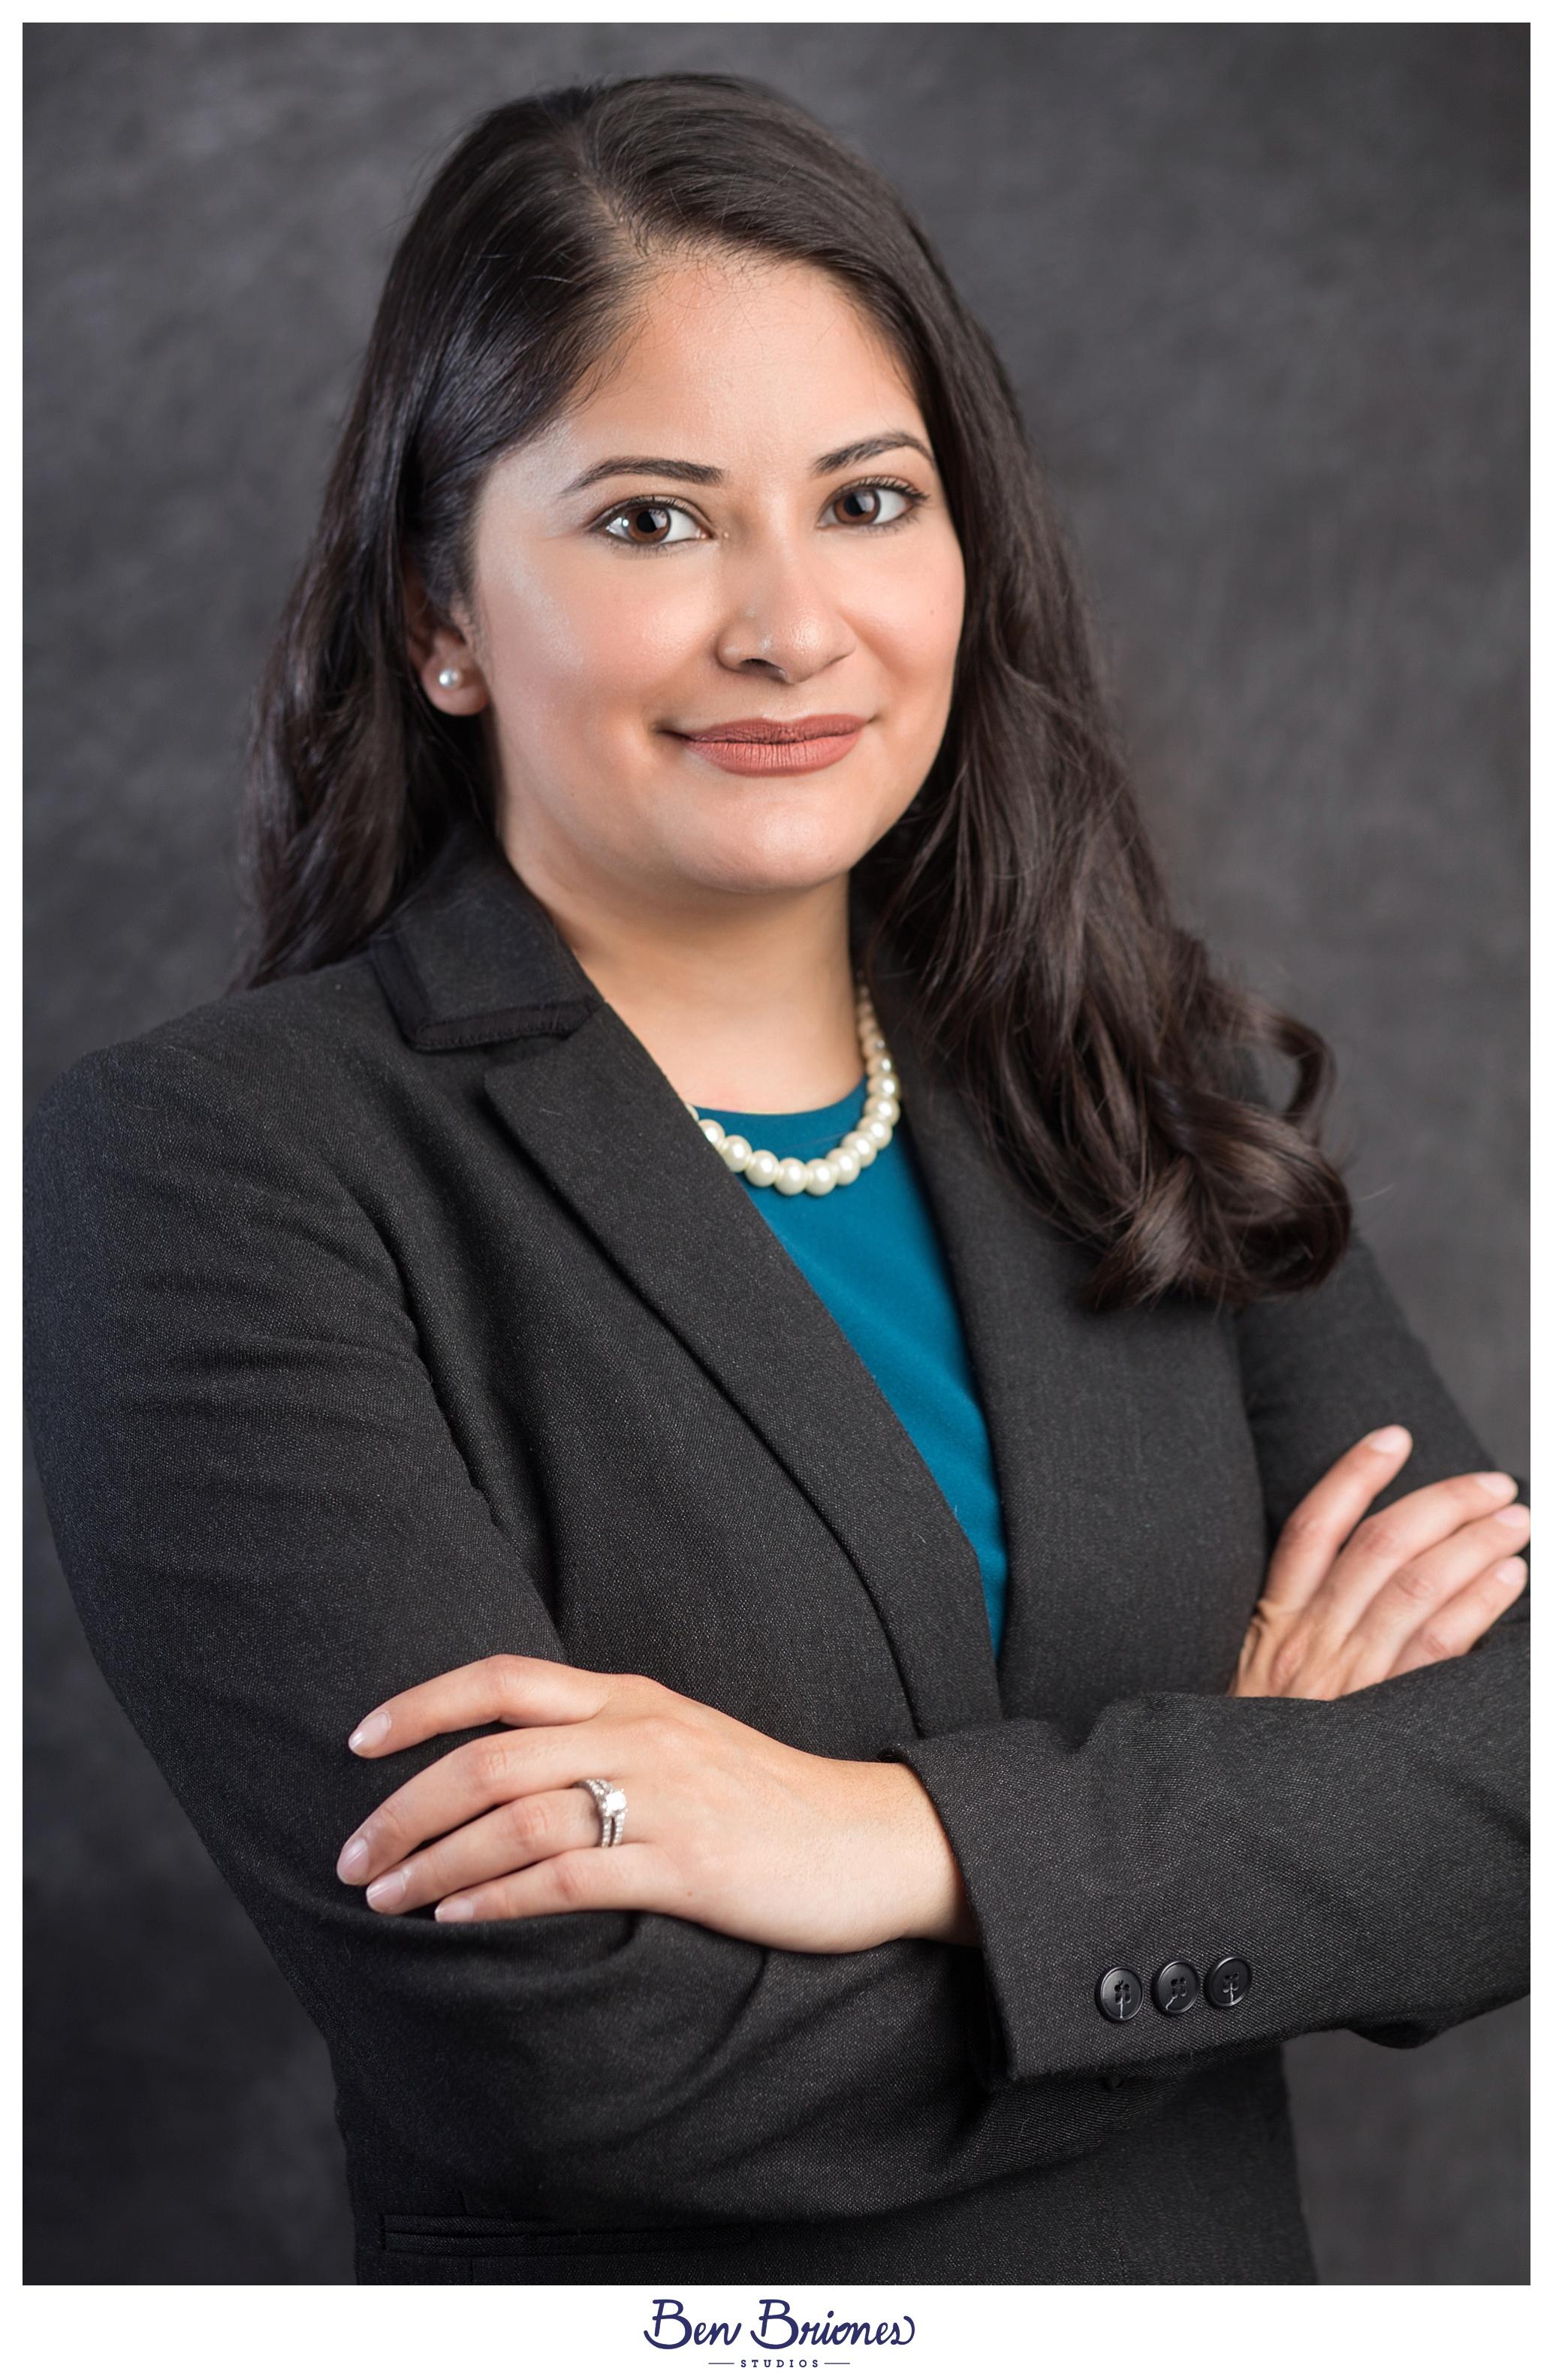 03.03.18_PRINT_Karla Olivarez Head Shots_BBS-1474_pp_WEB